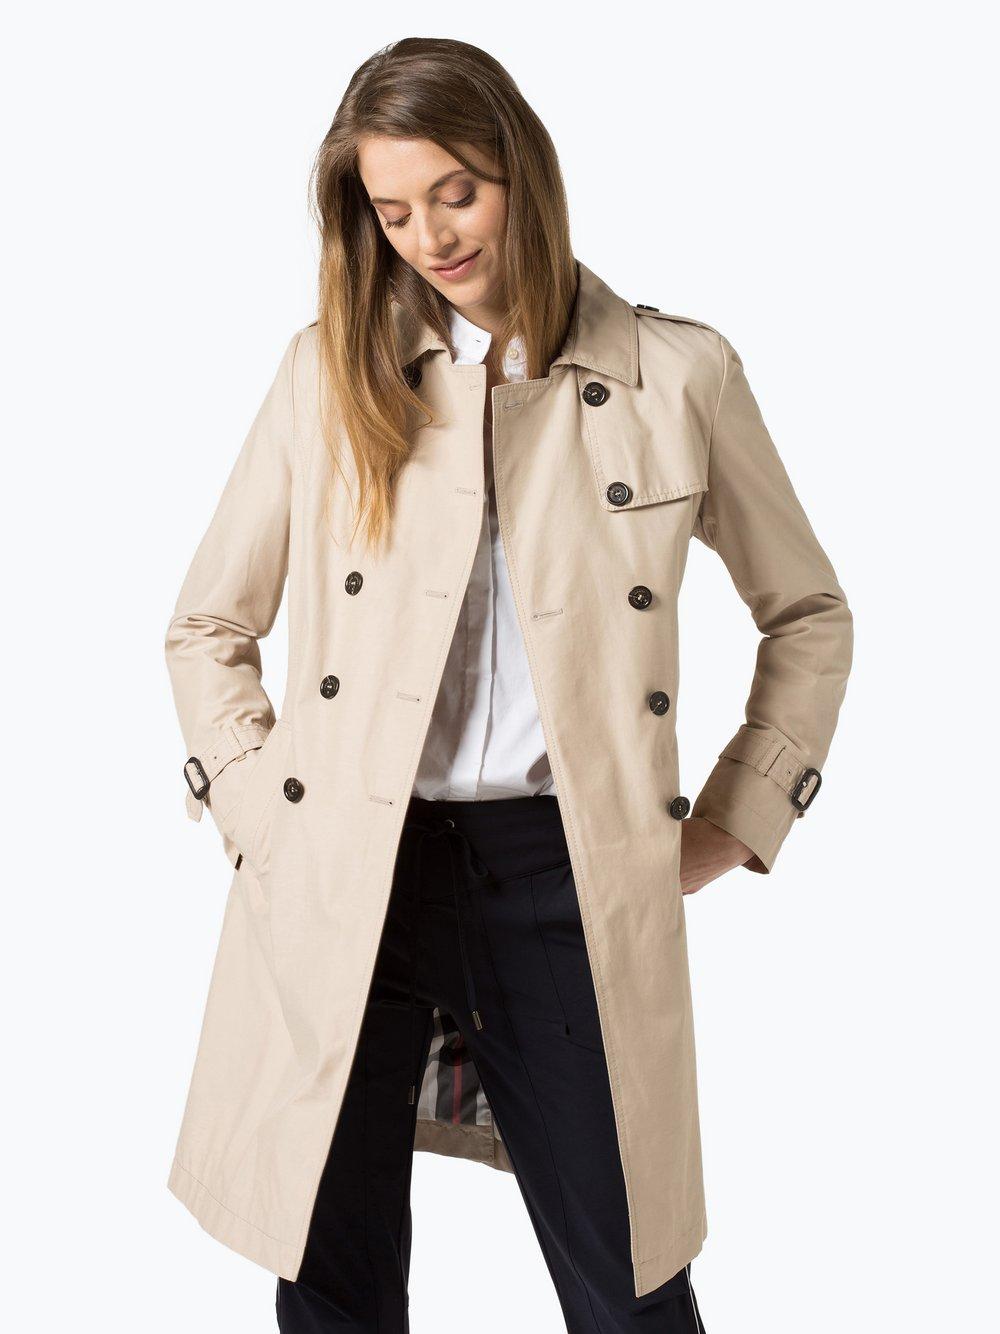 an vorderster Front der Zeit Brandneu heiß-verkauf echt Fuchs Schmitt Damen Mantel online kaufen   VANGRAAF.COM